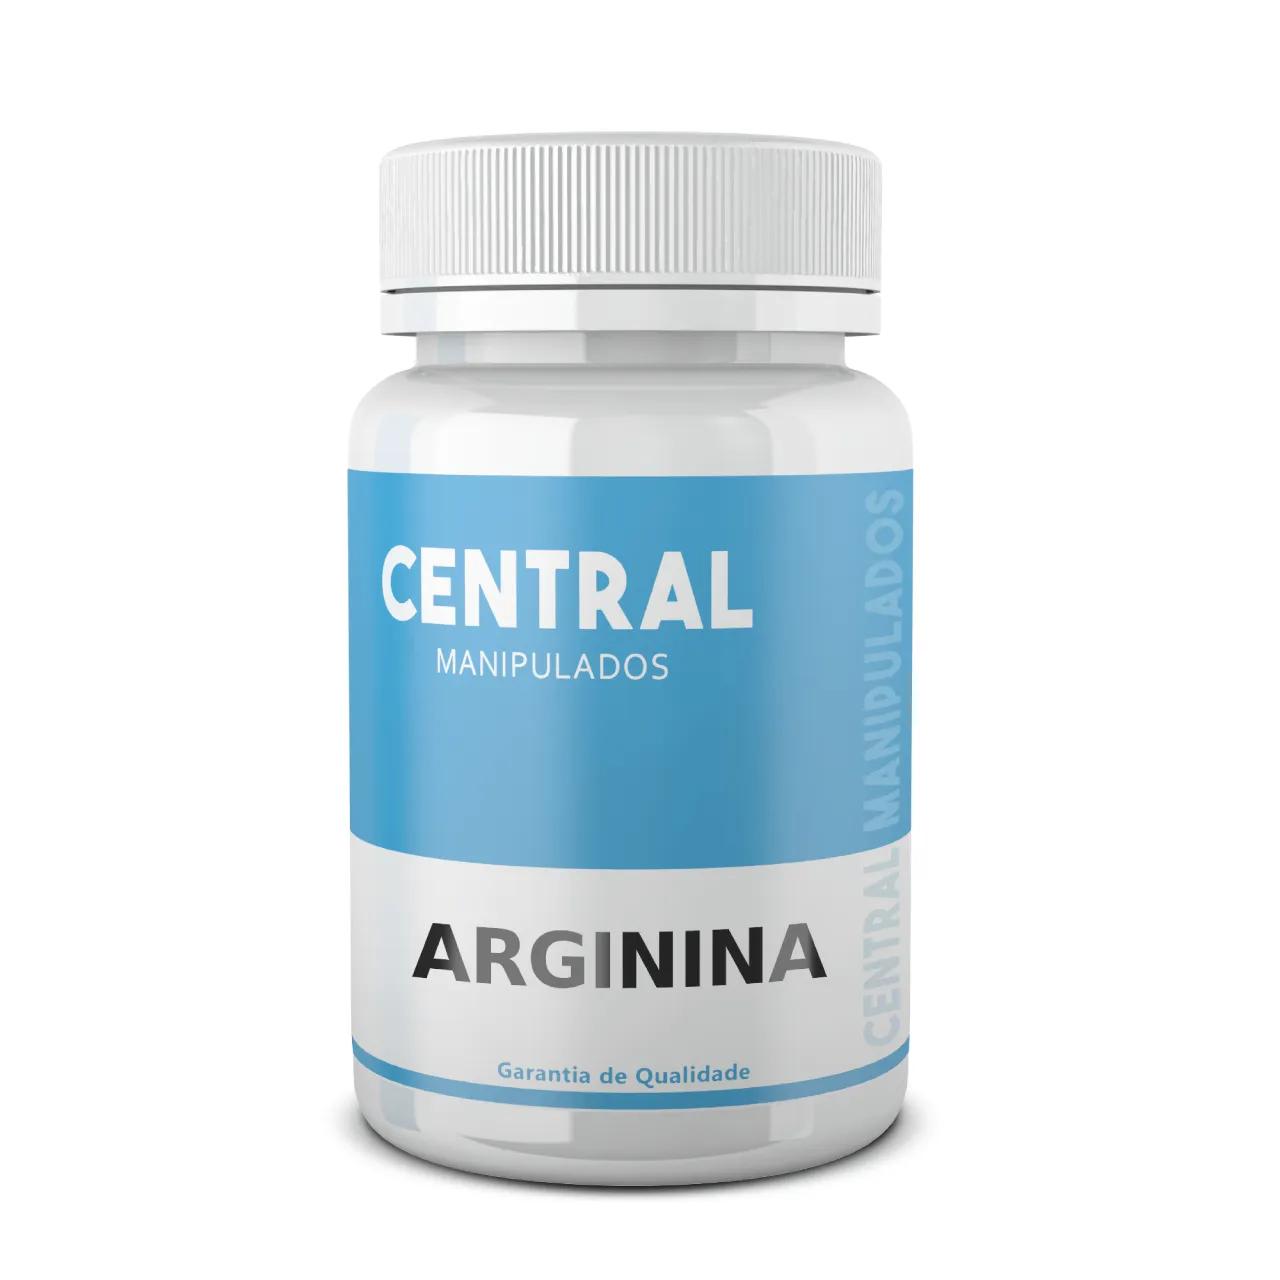 Arginina 500mg - 120 cápsulas - Ganho de massa muscular, Limita o Armazenamento de Gordura, Saúde Cardiovascular, Vasodilatador